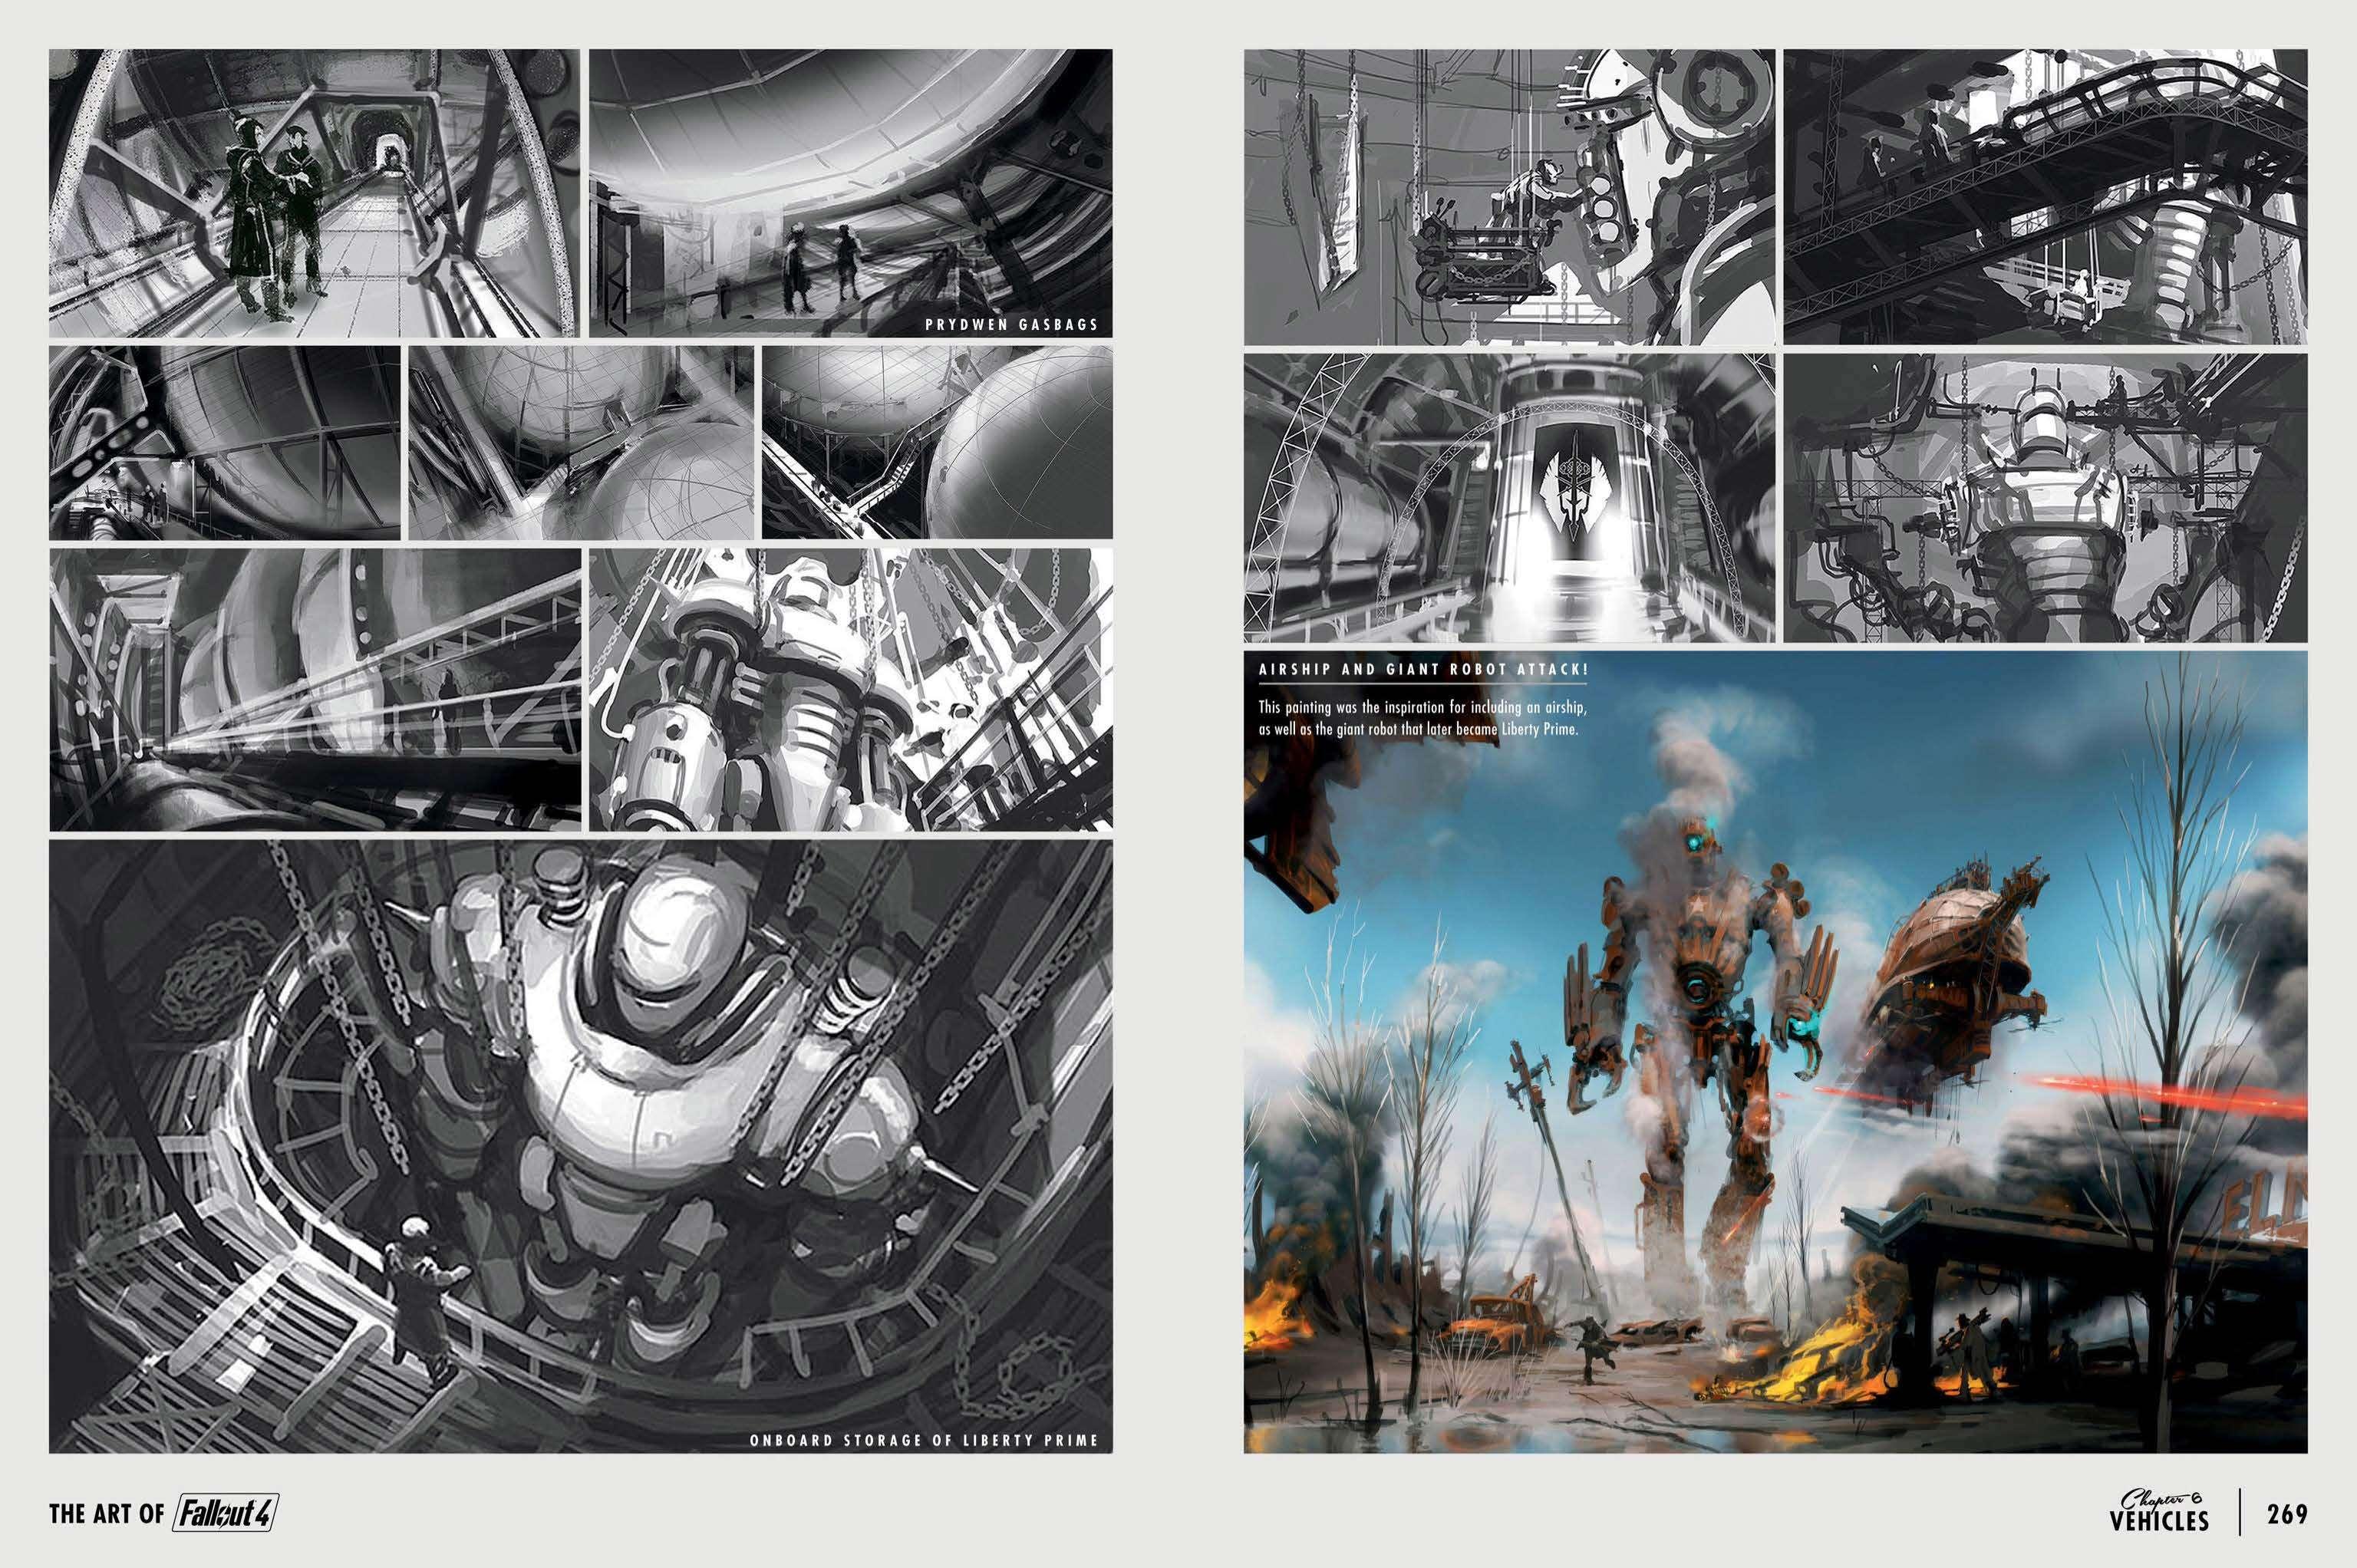 The Art of Fallout 4 - # 135 - Fallout 4 арт